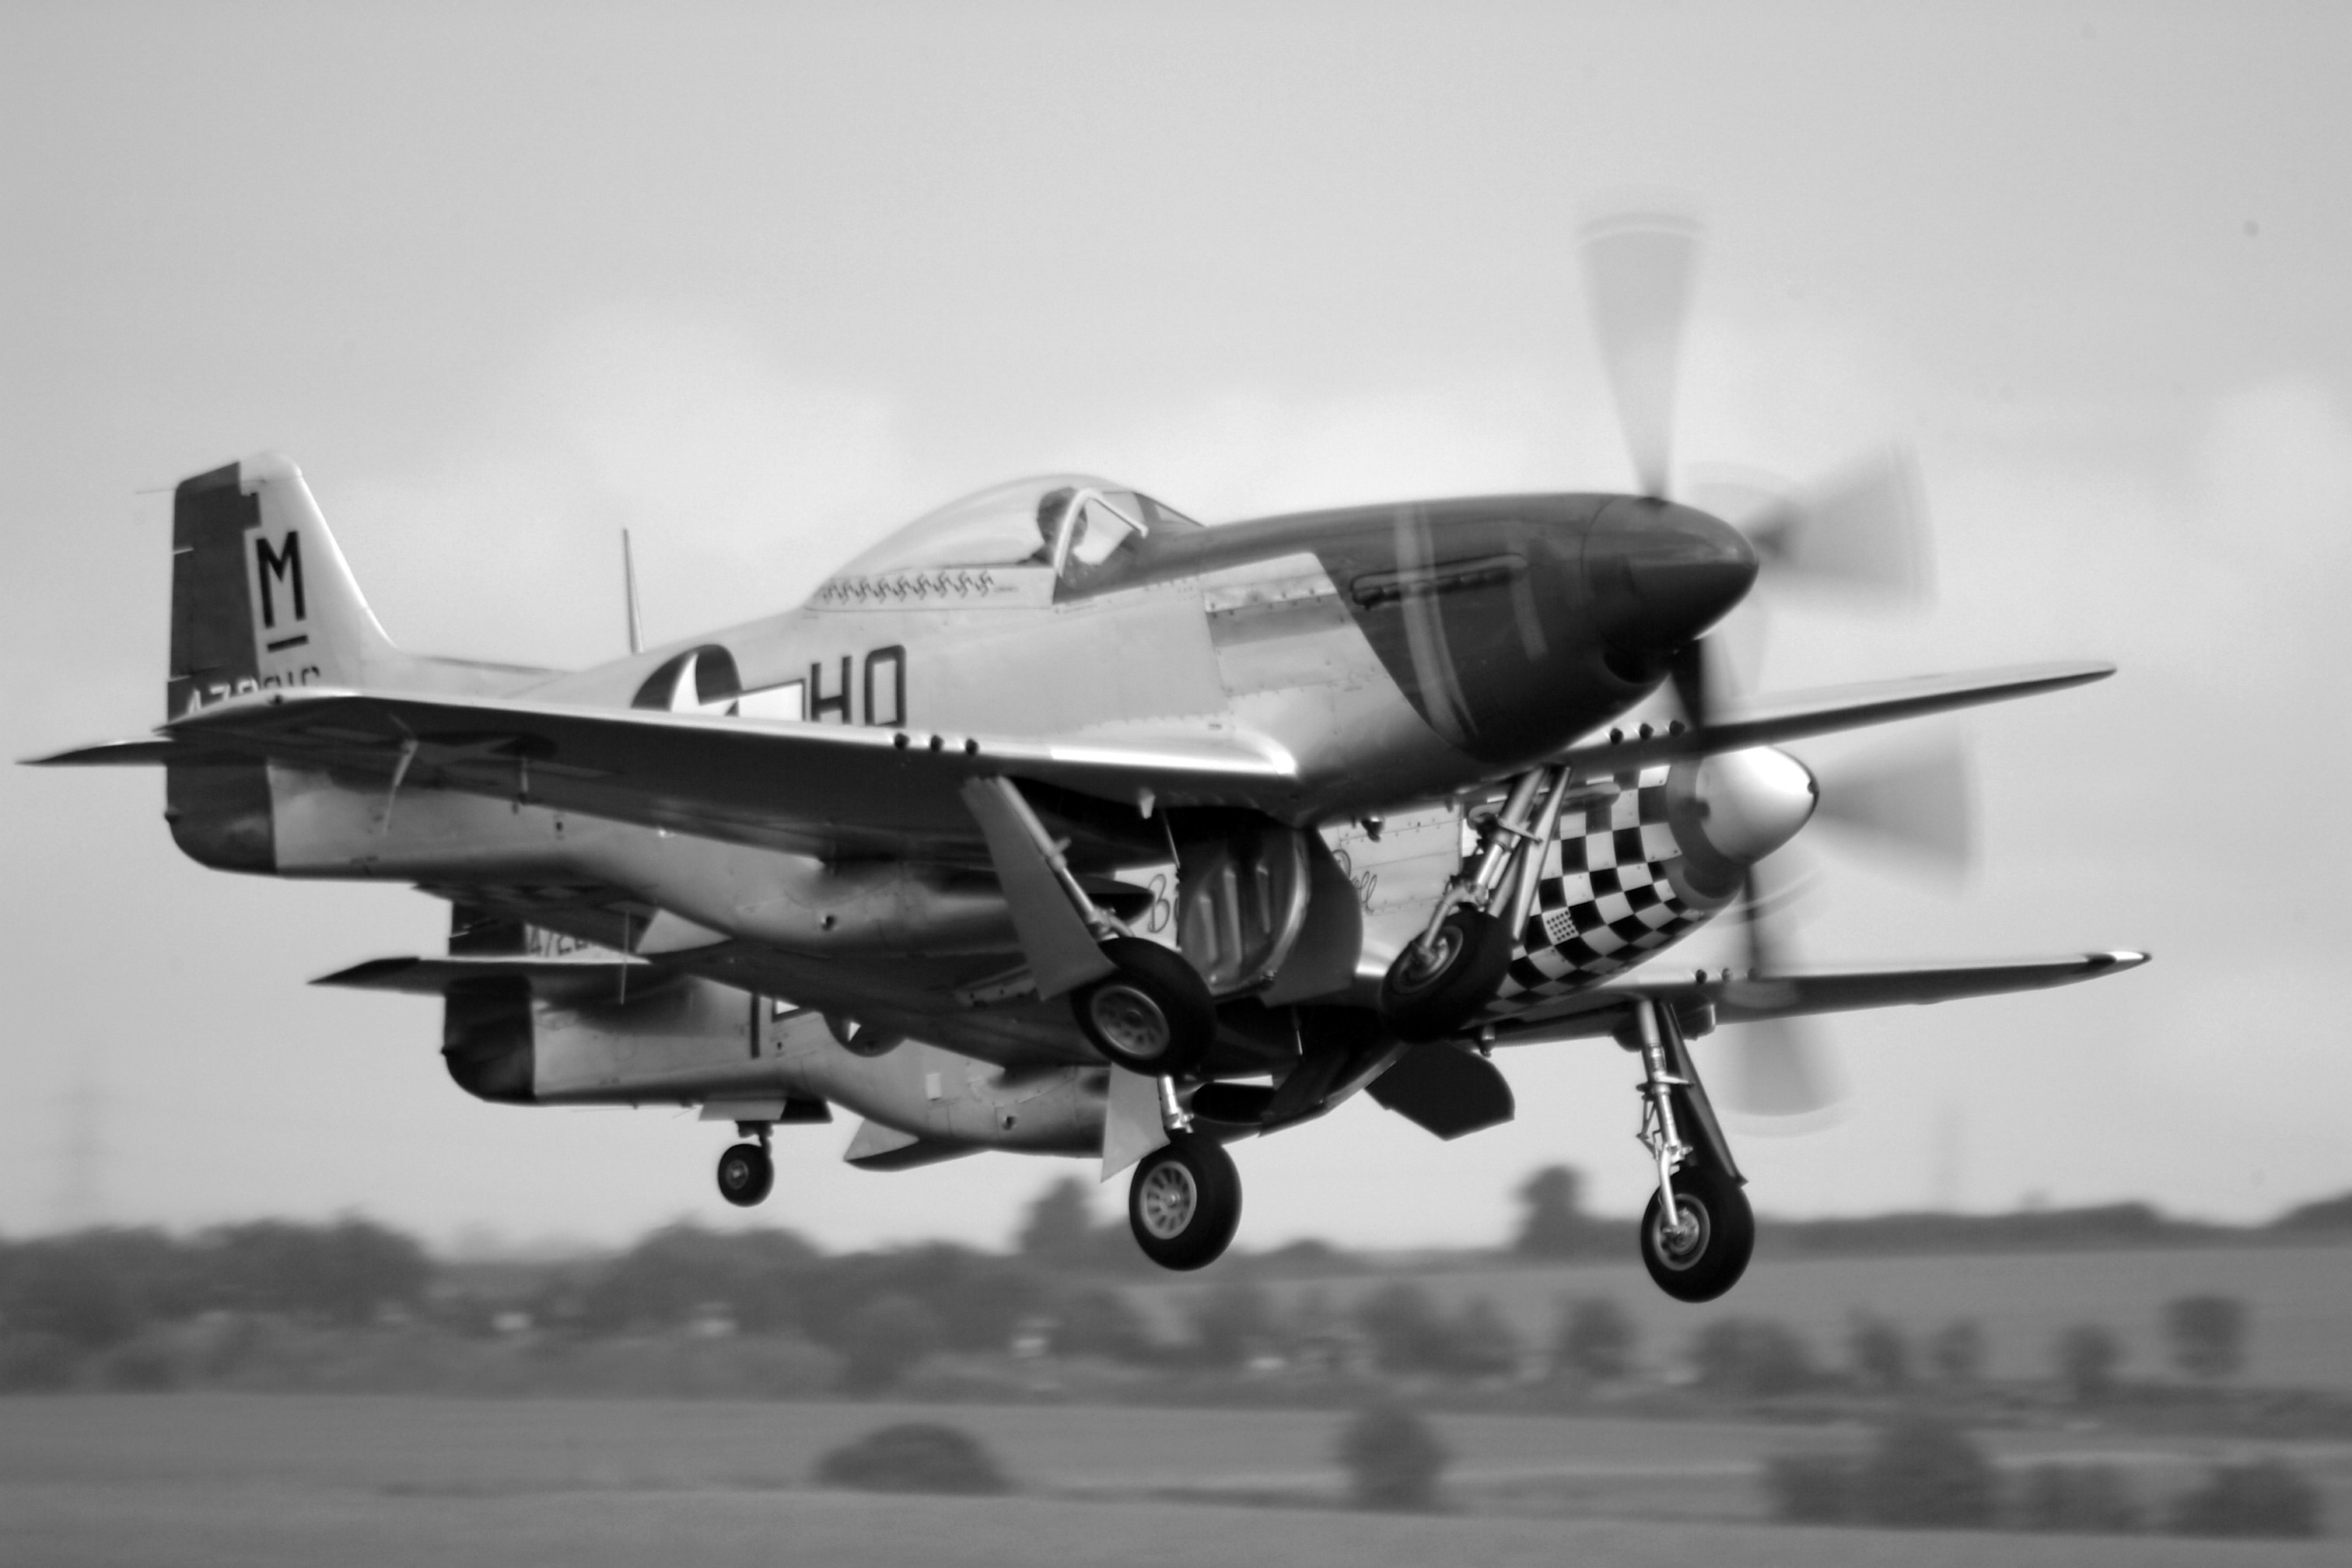 D030 P-51D Mustangs